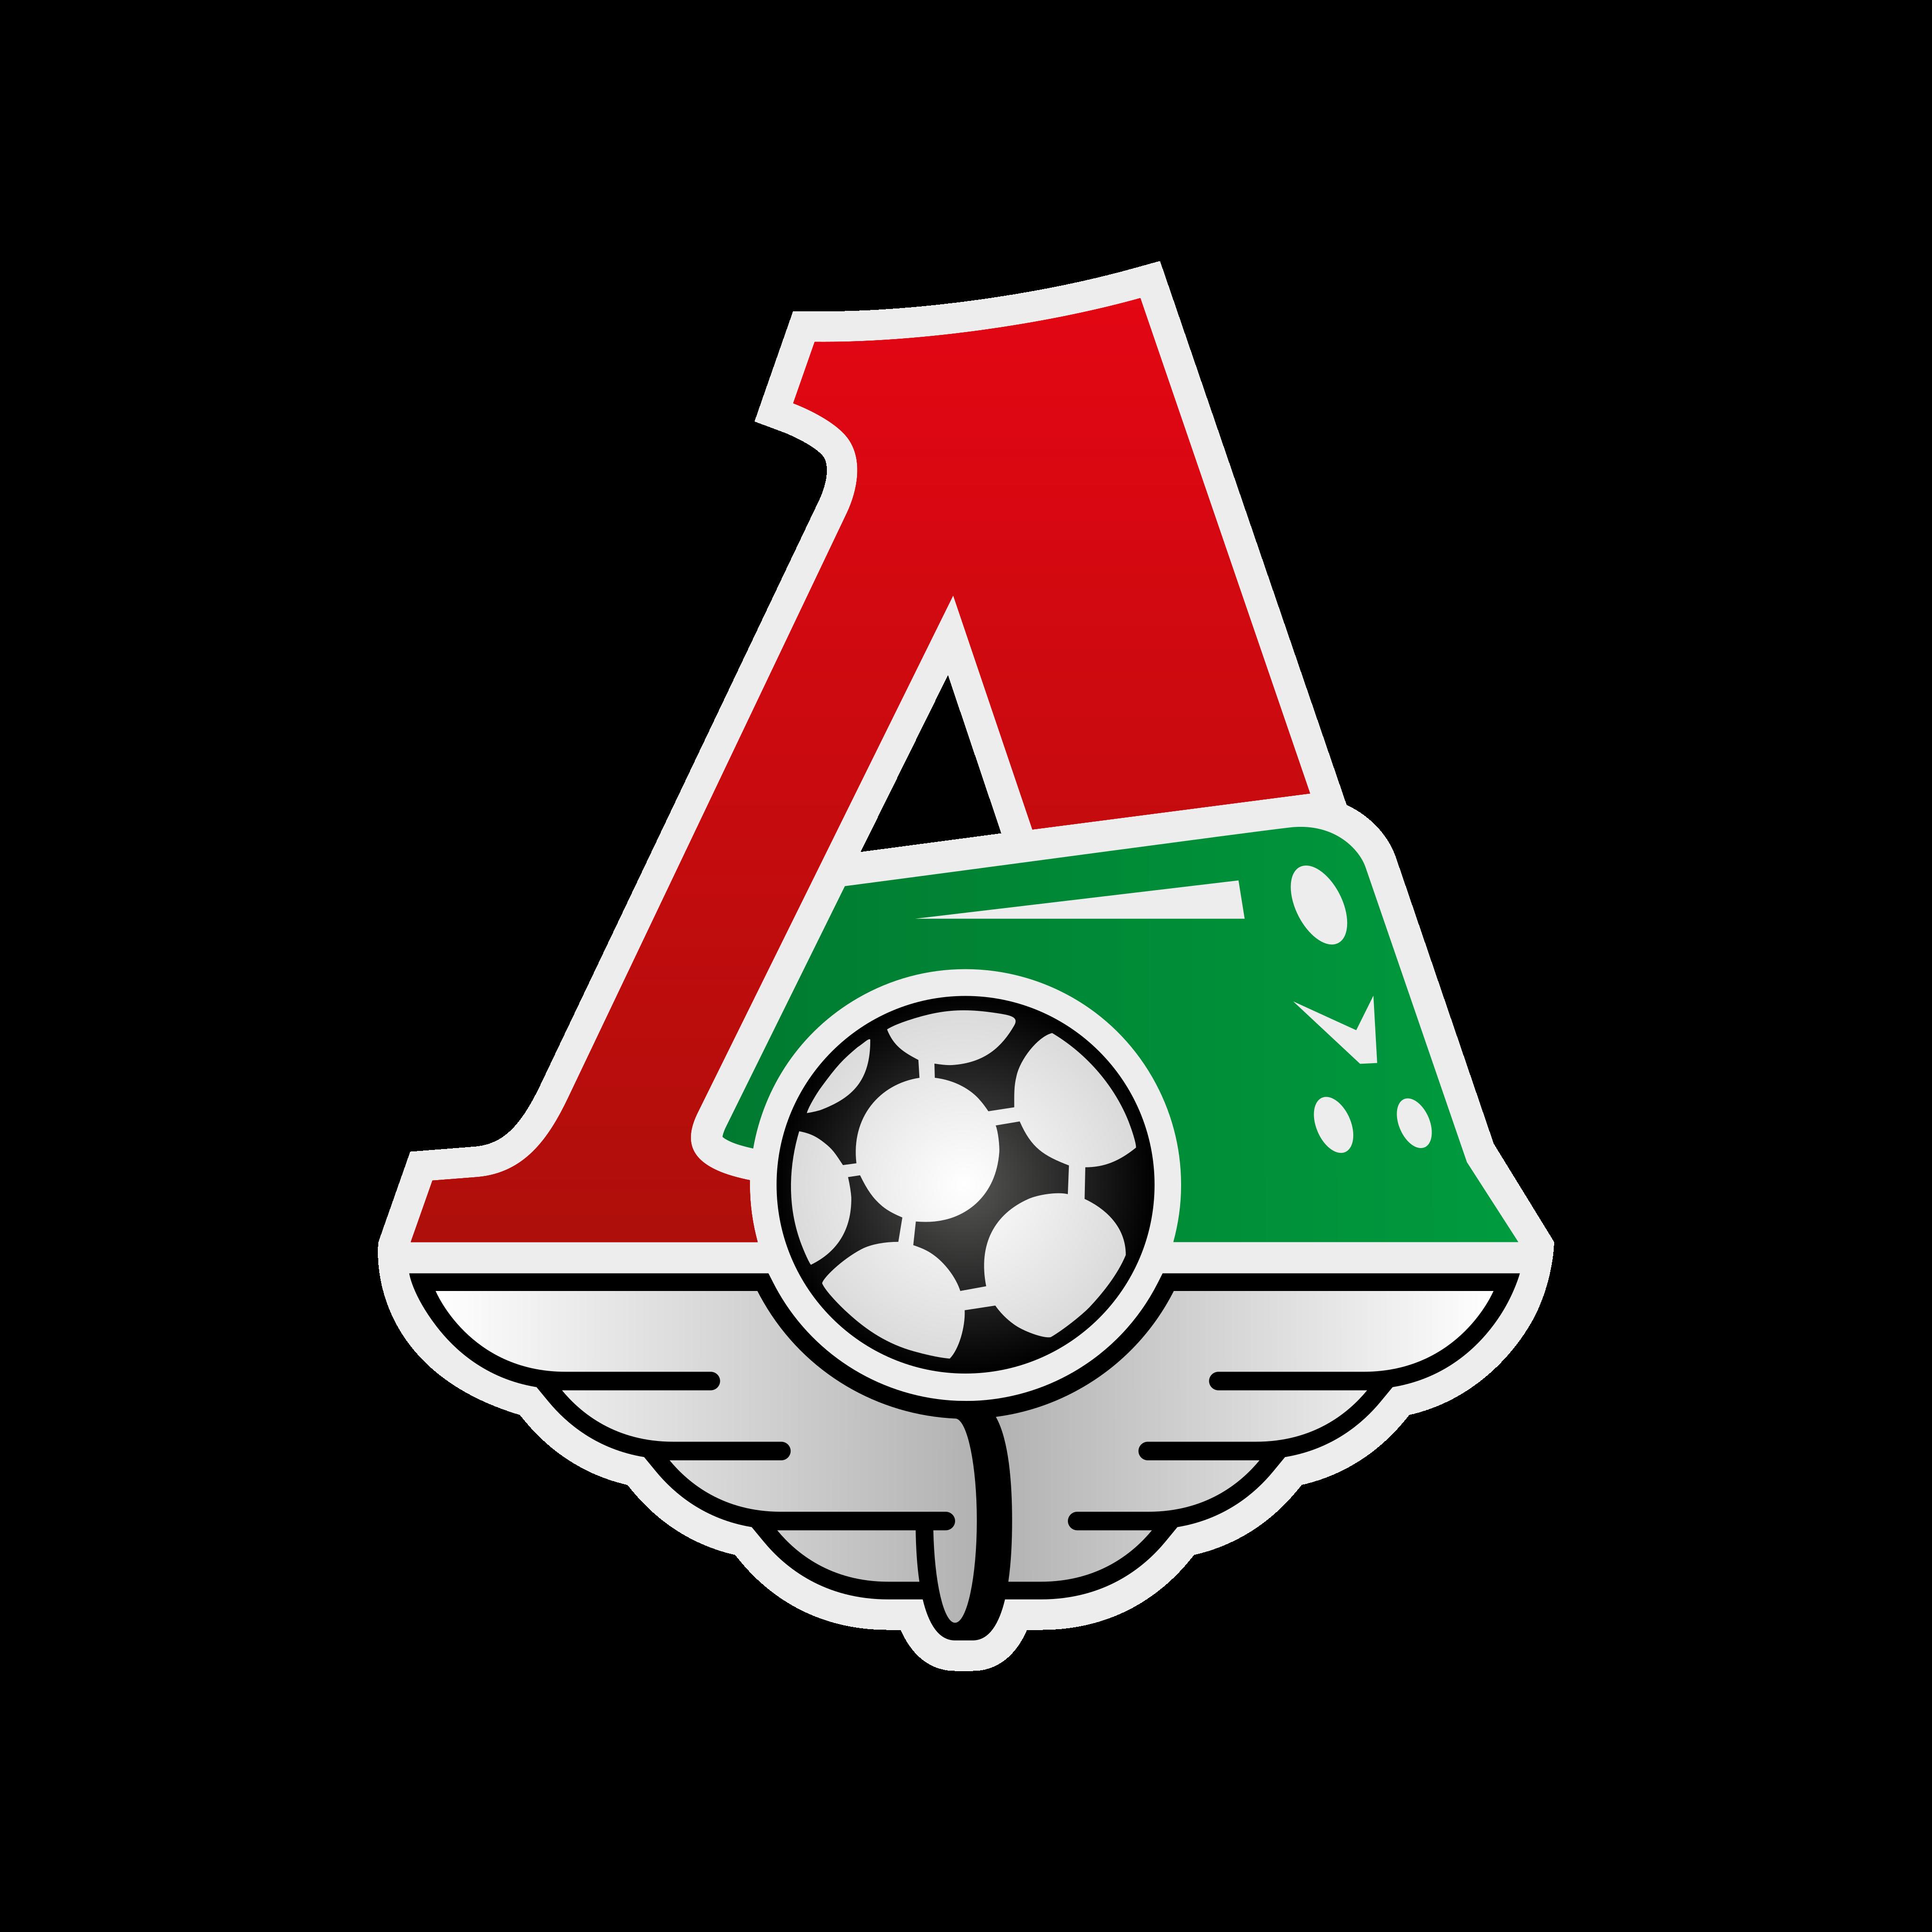 lokomotiv logo 0 - FC Lokomotiv Moscú Logo